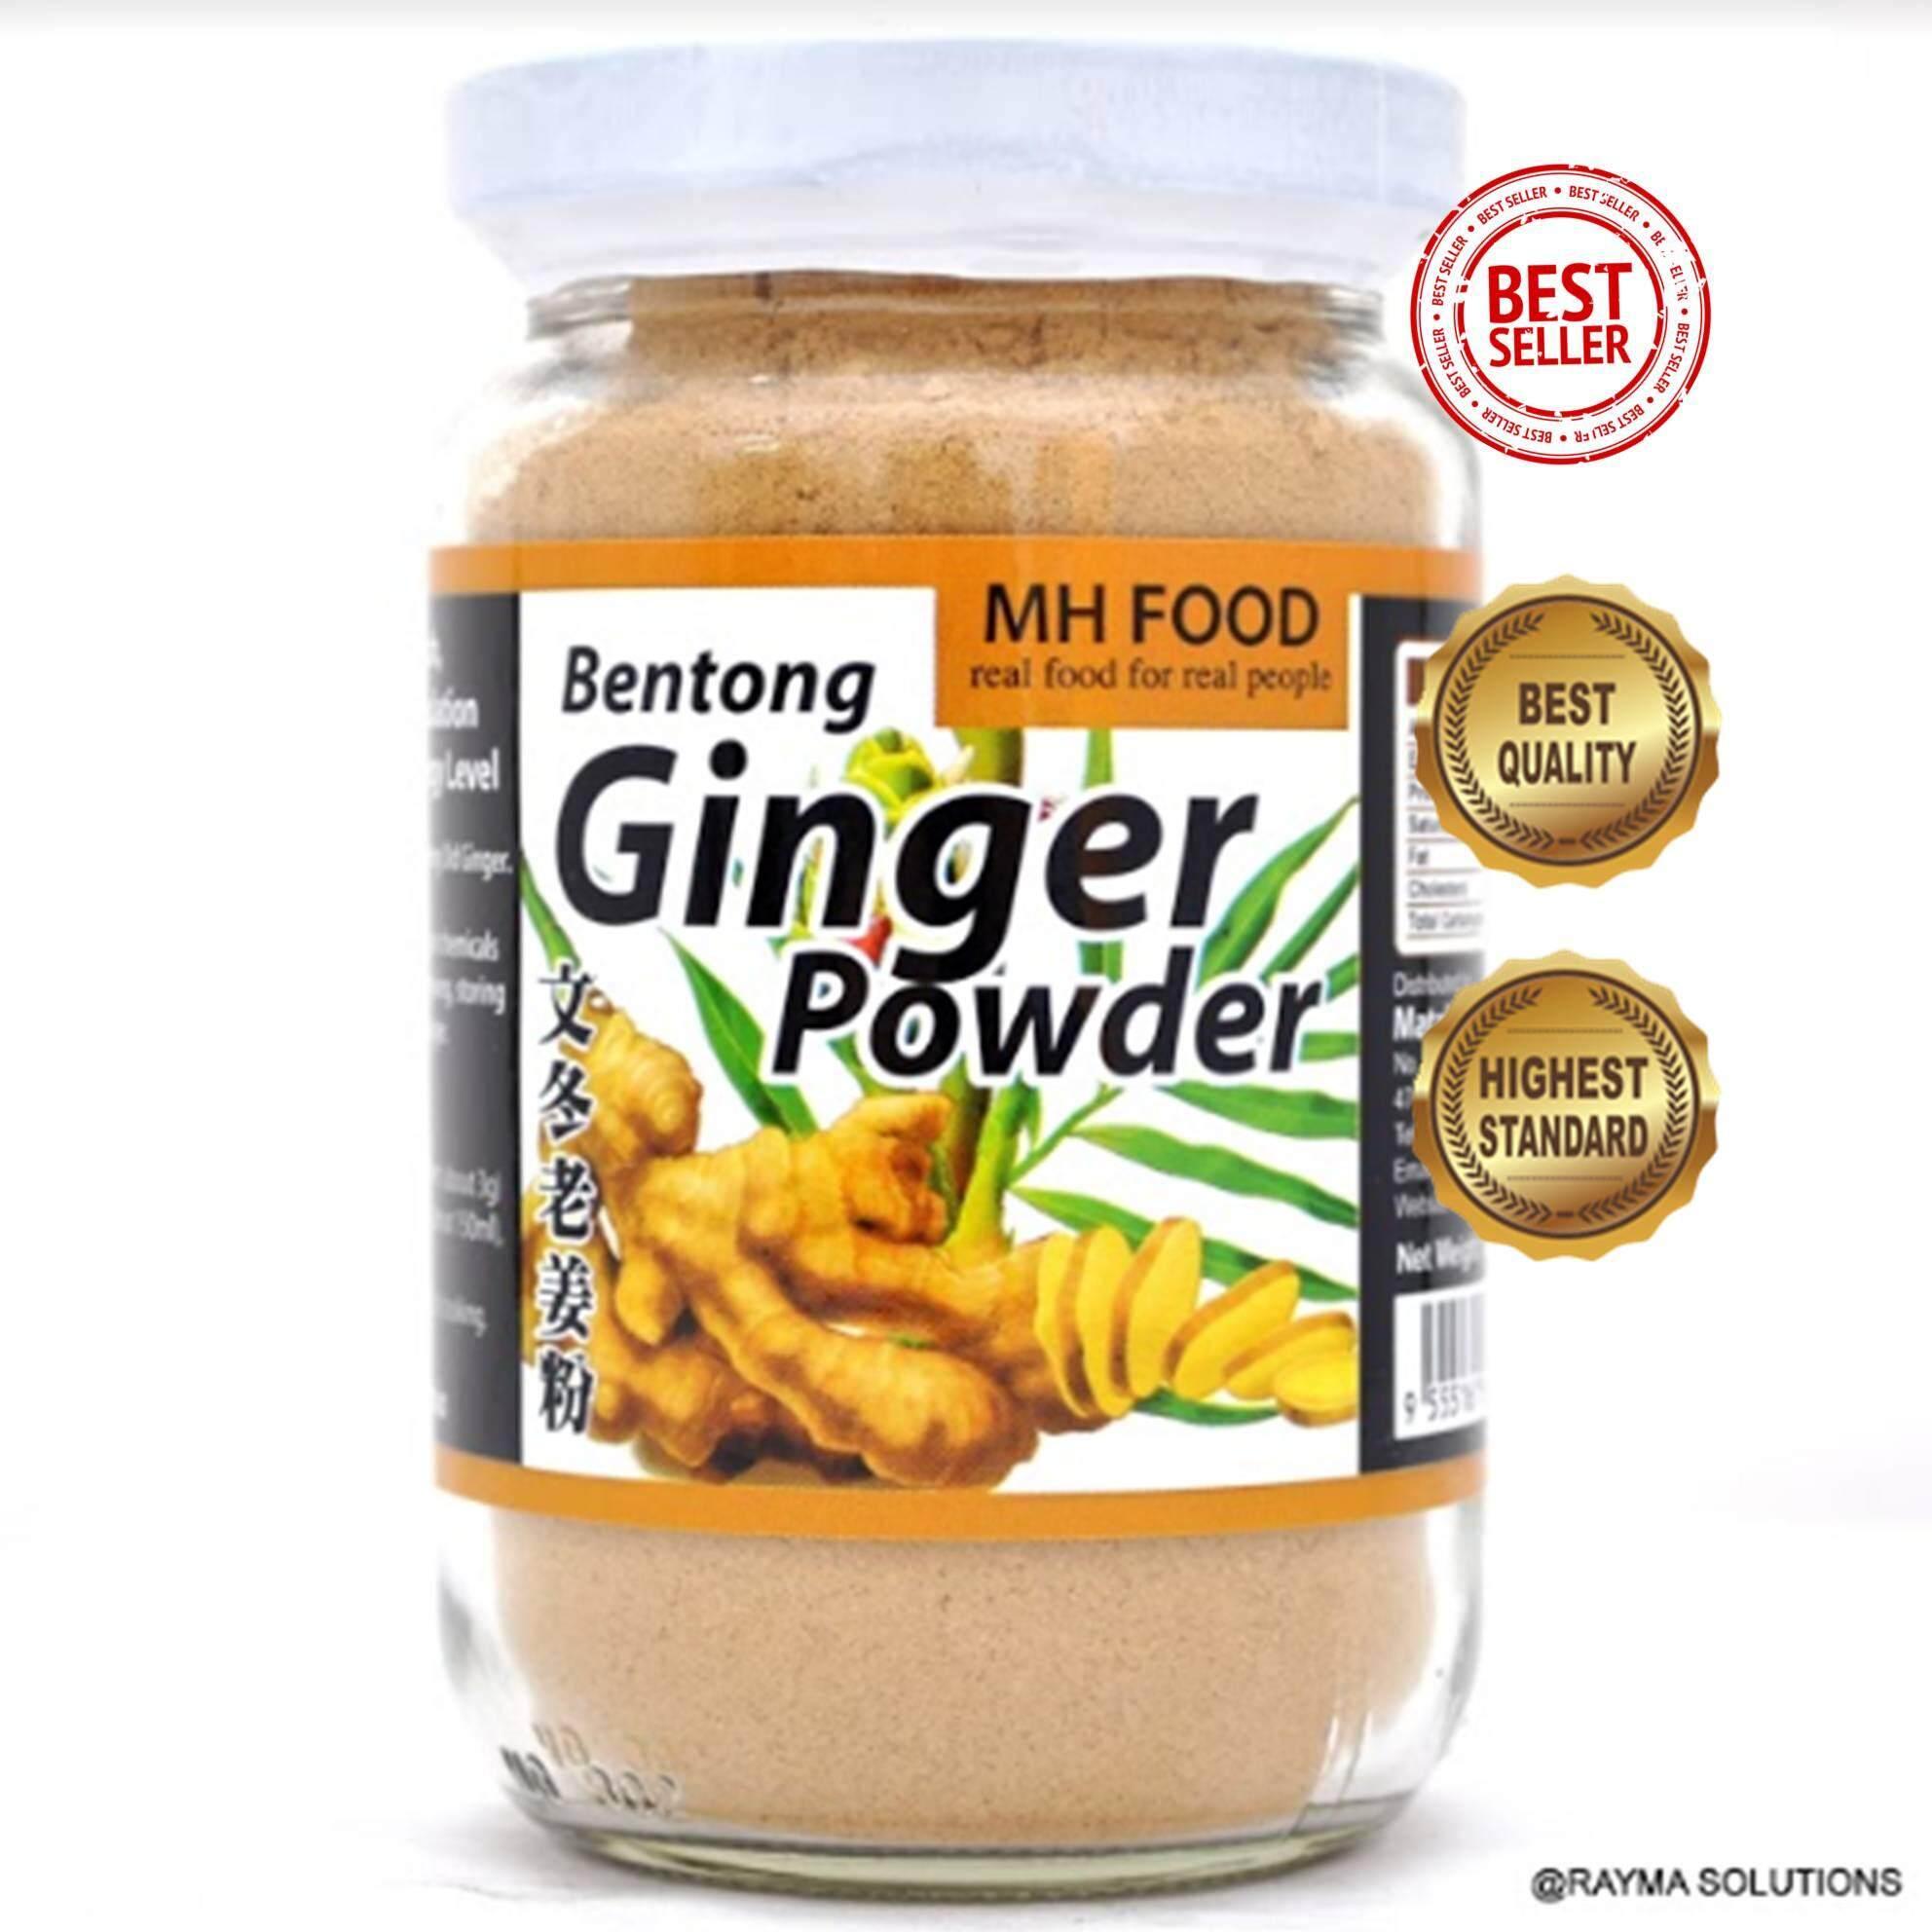 MH FOOD Bentong Ginger Powder 100g